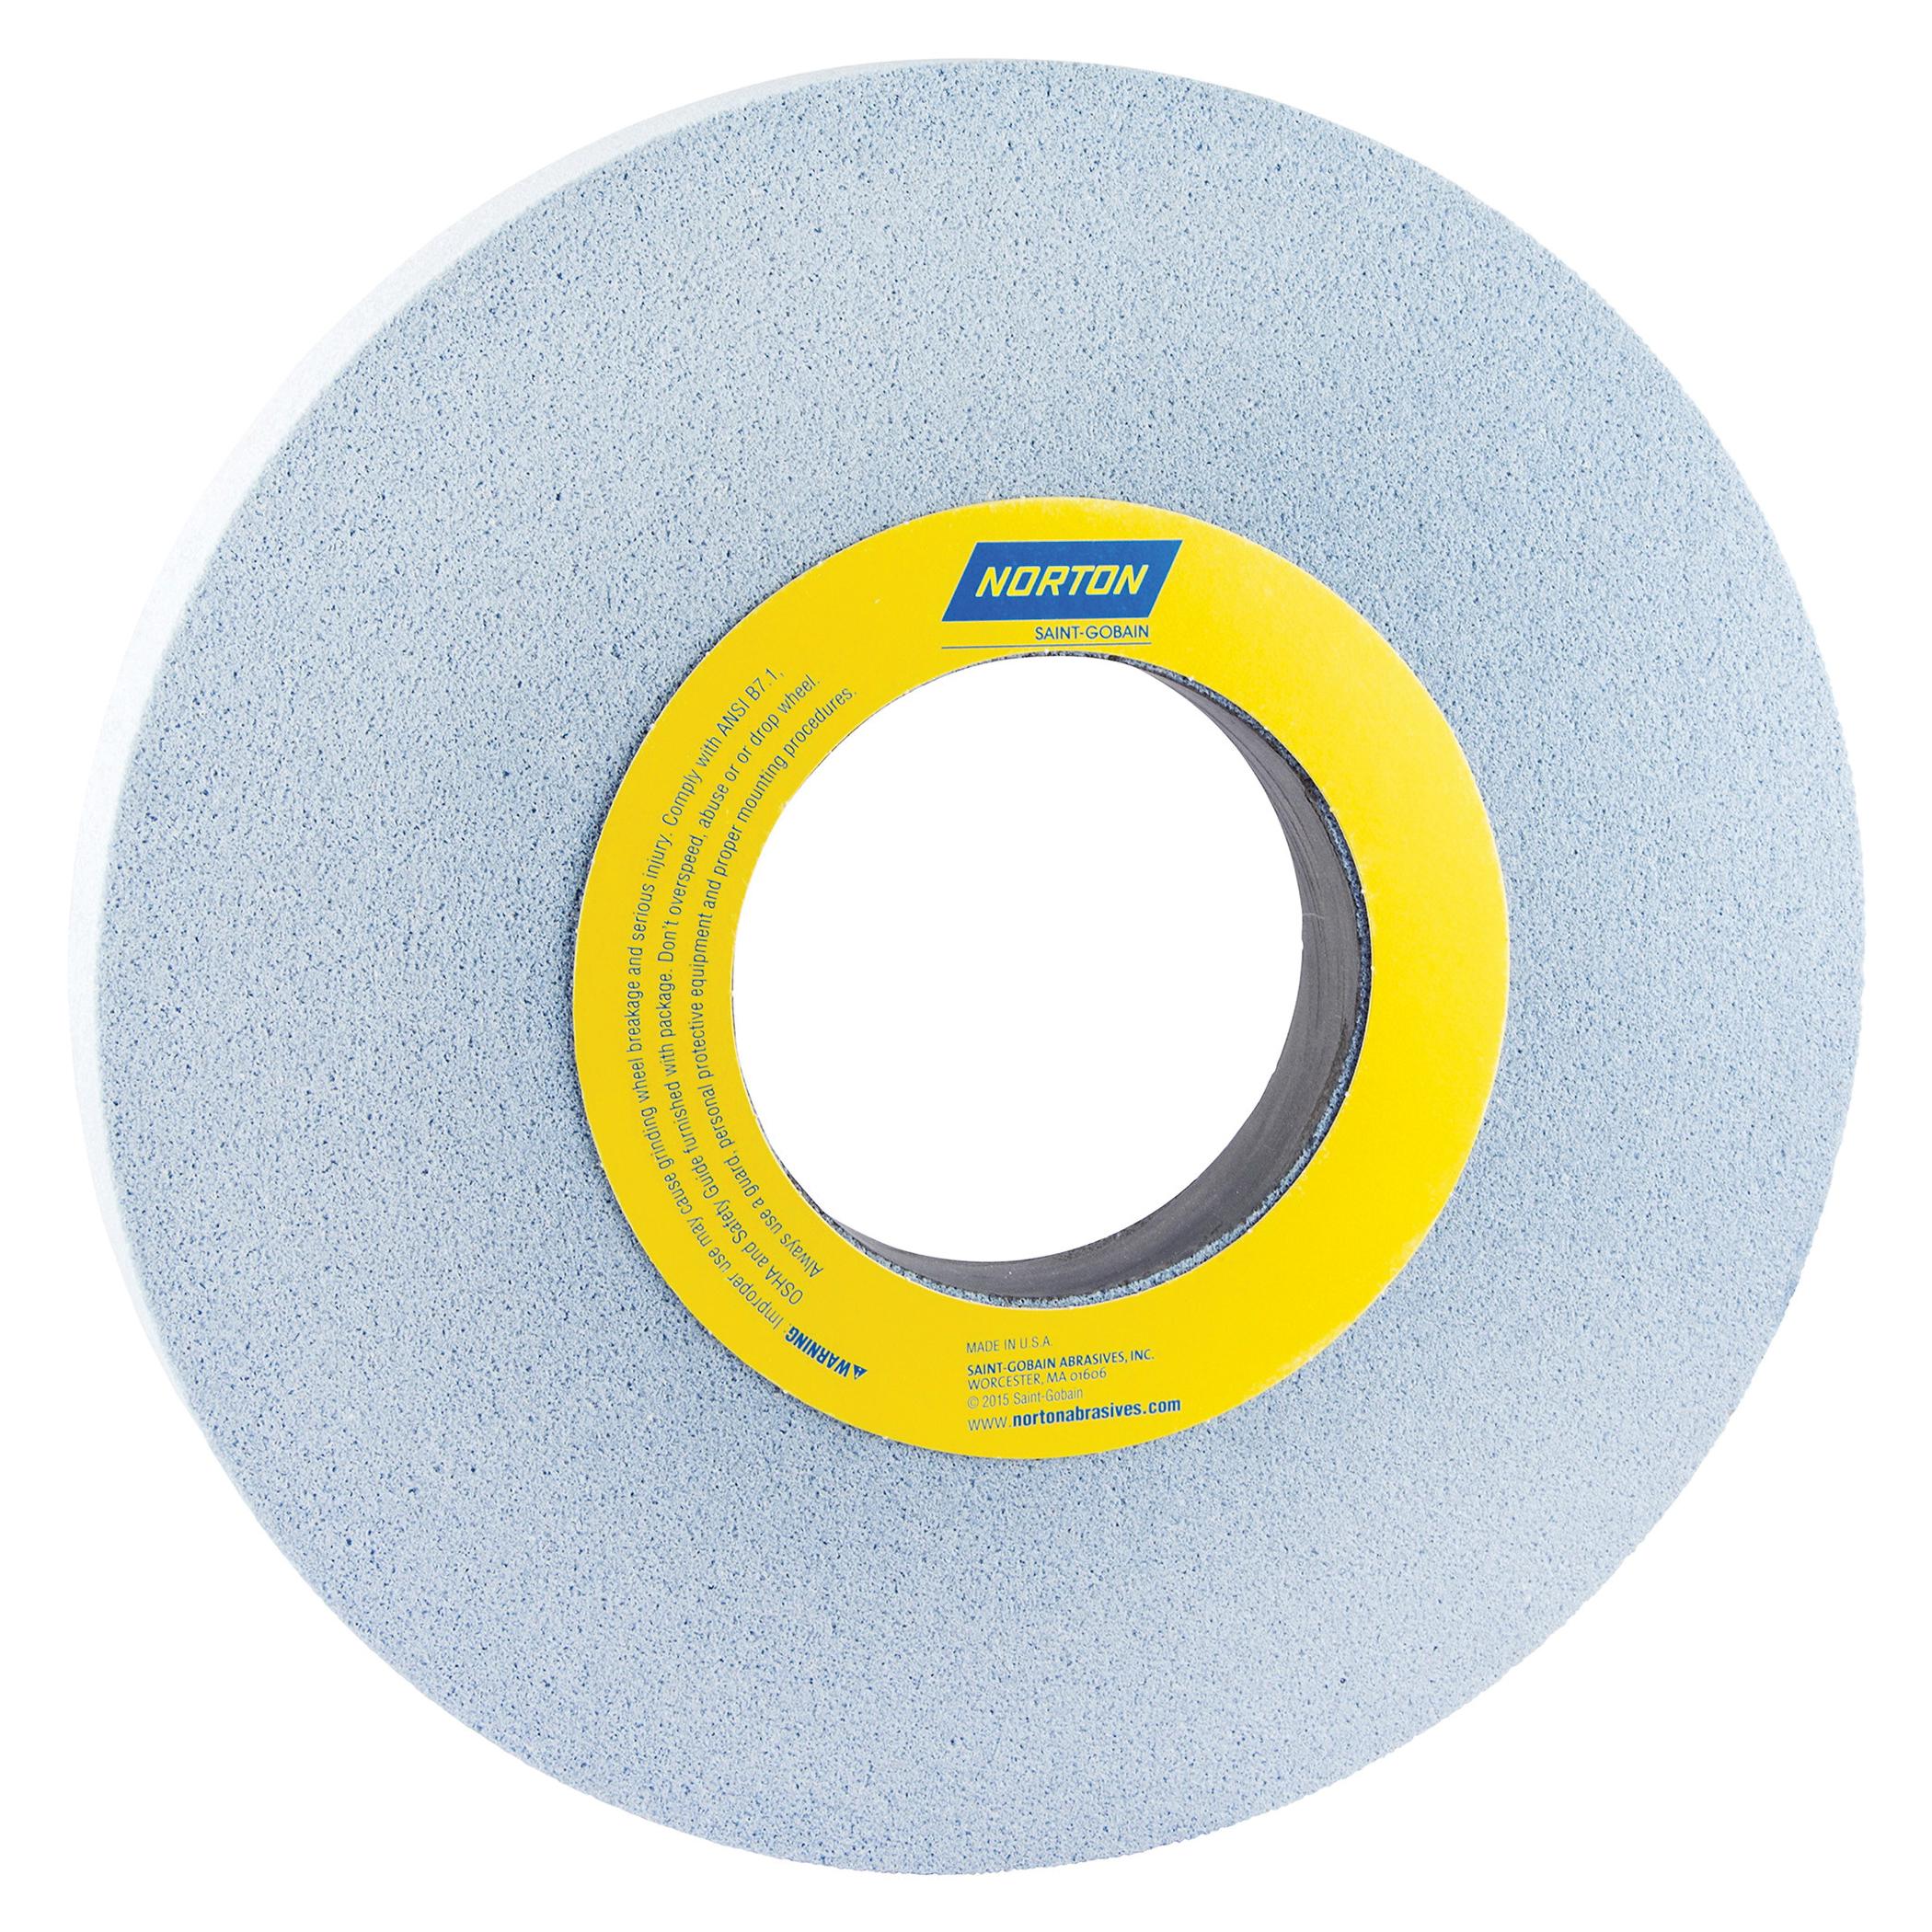 Norton® 66253363871 5SG Straight Toolroom Wheel, 14 in Dia x 1 in THK, 5 in Center Hole, 60 Grit, Ceramic Alumina/Friable Aluminum Oxide Abrasive